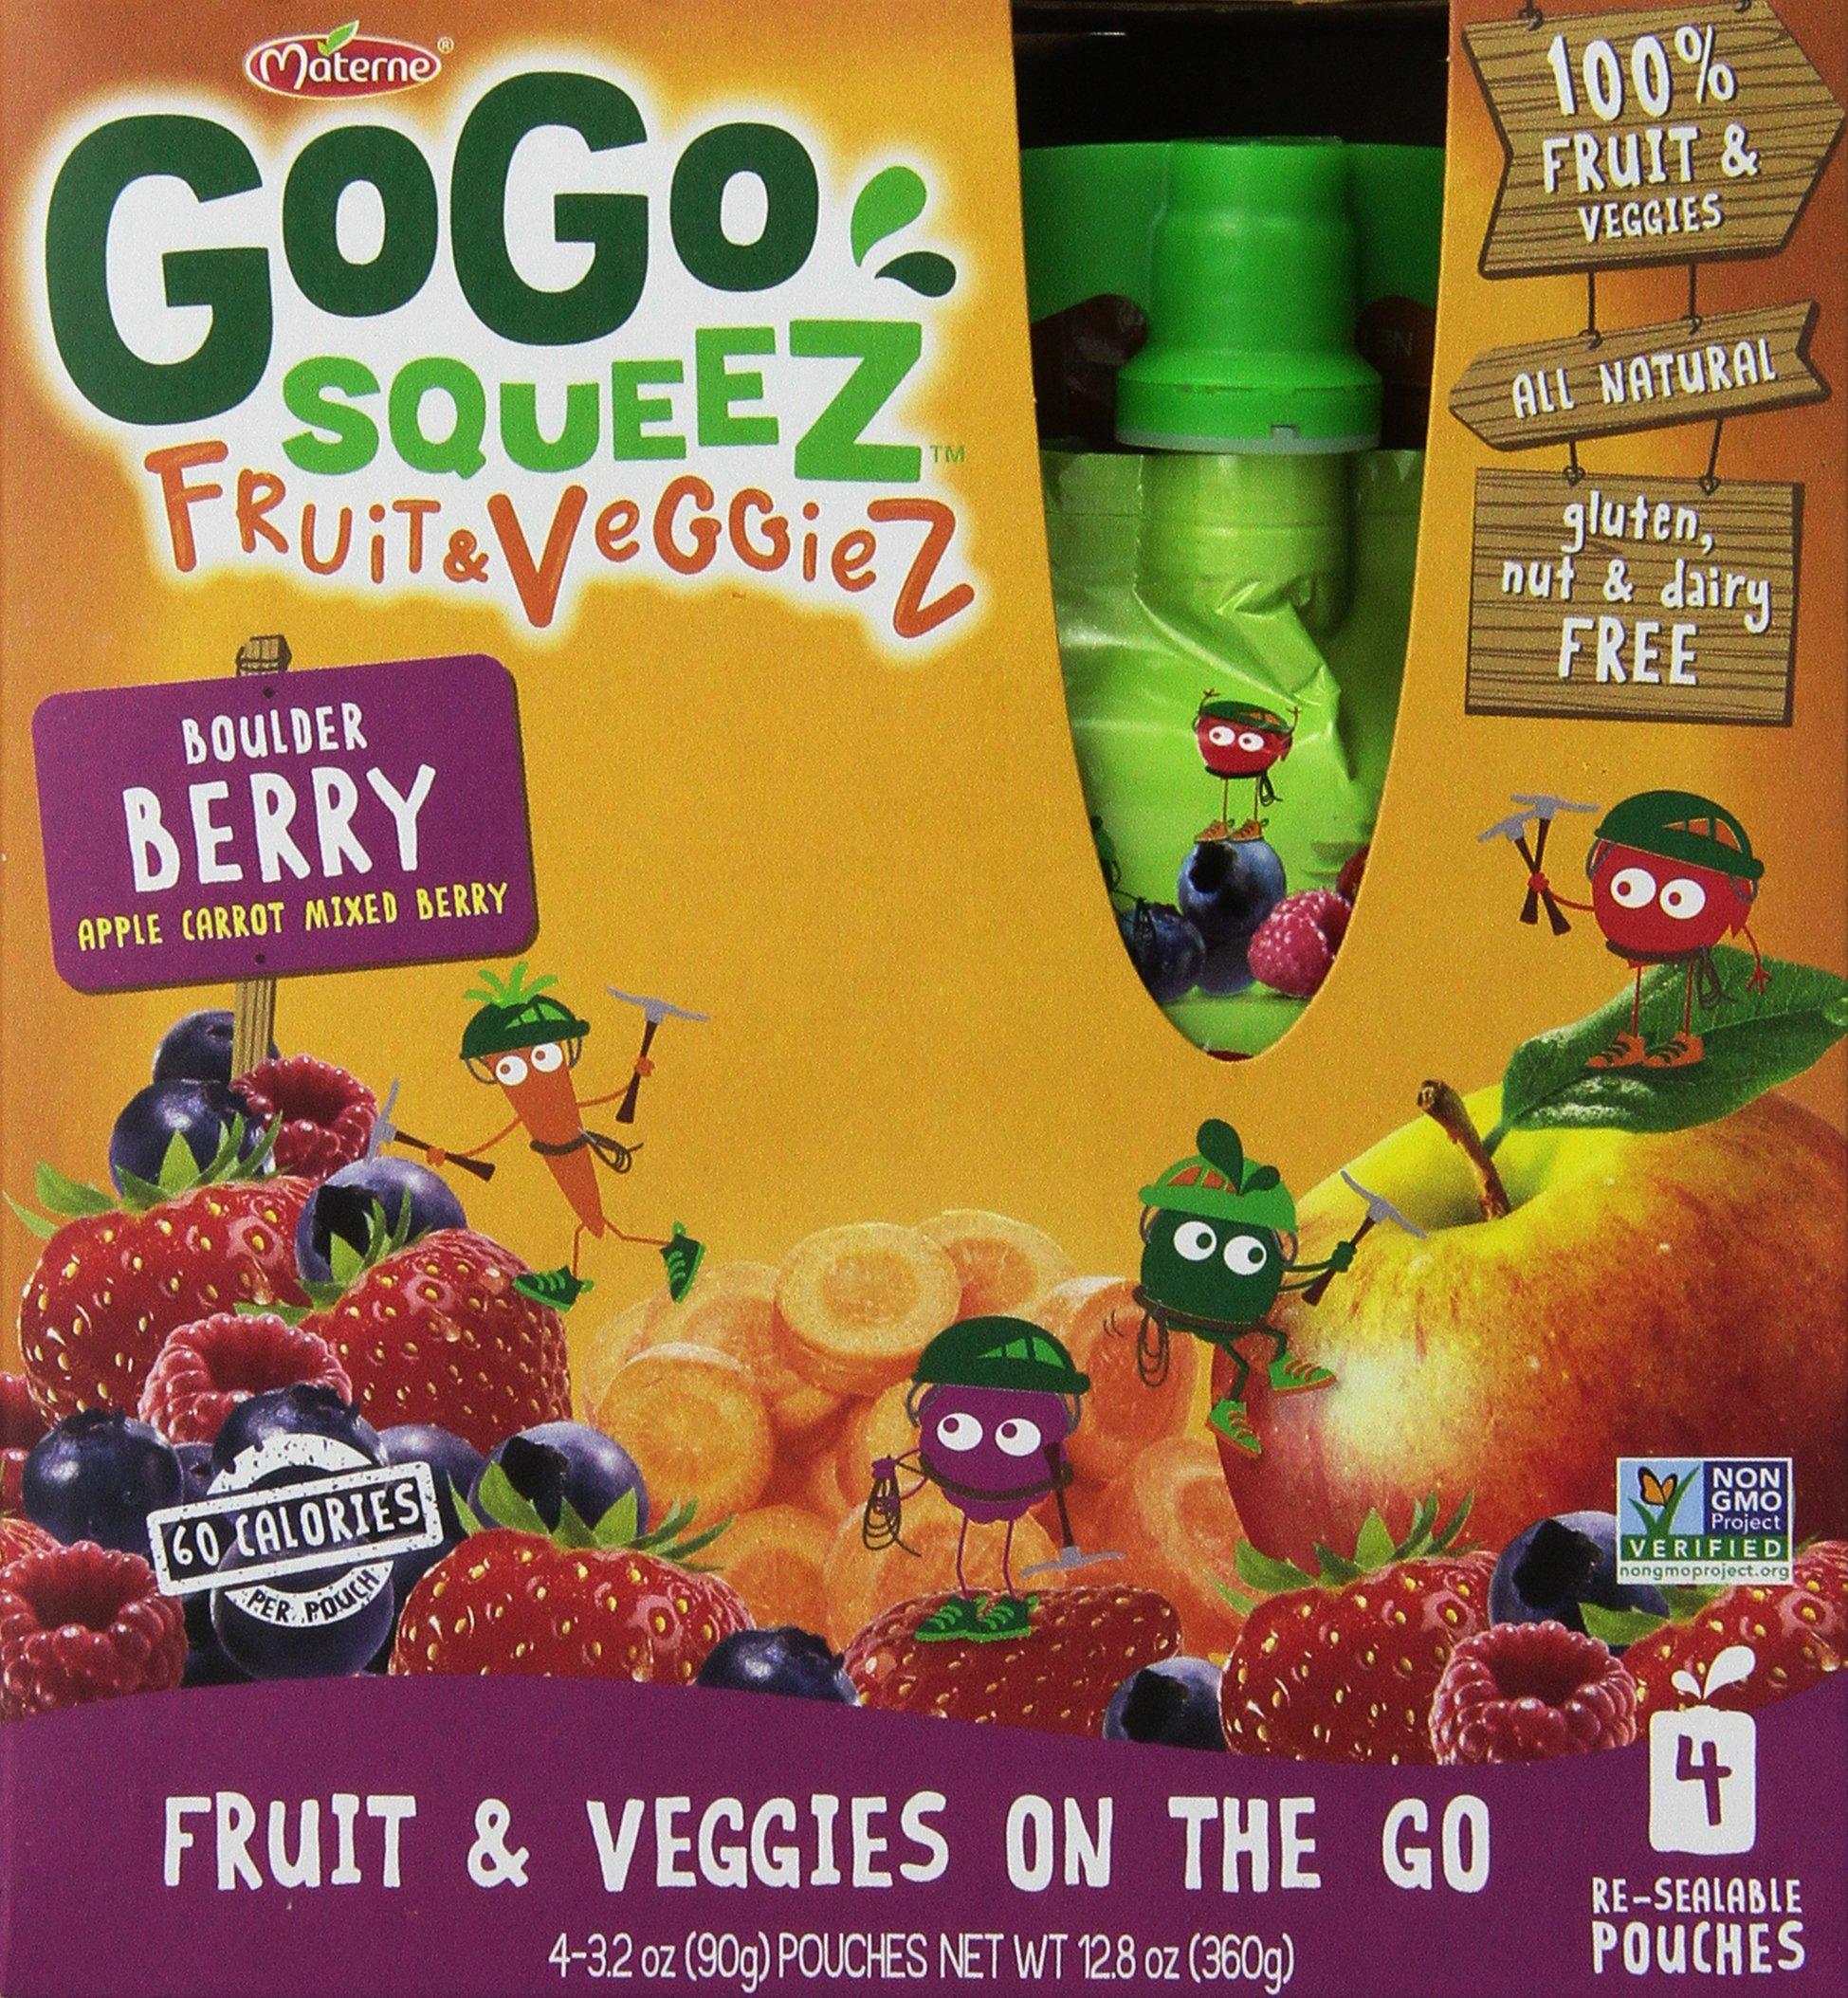 GoGo SqueeZ Fruit & VeggieZ on the Go, Apple Carrot Mixed Berry , 3.2 Ounce Portable BPA-Free Pouches, Gluten-Free, 48 Total Pouches (12 Boxes with 4 Pouches Each)